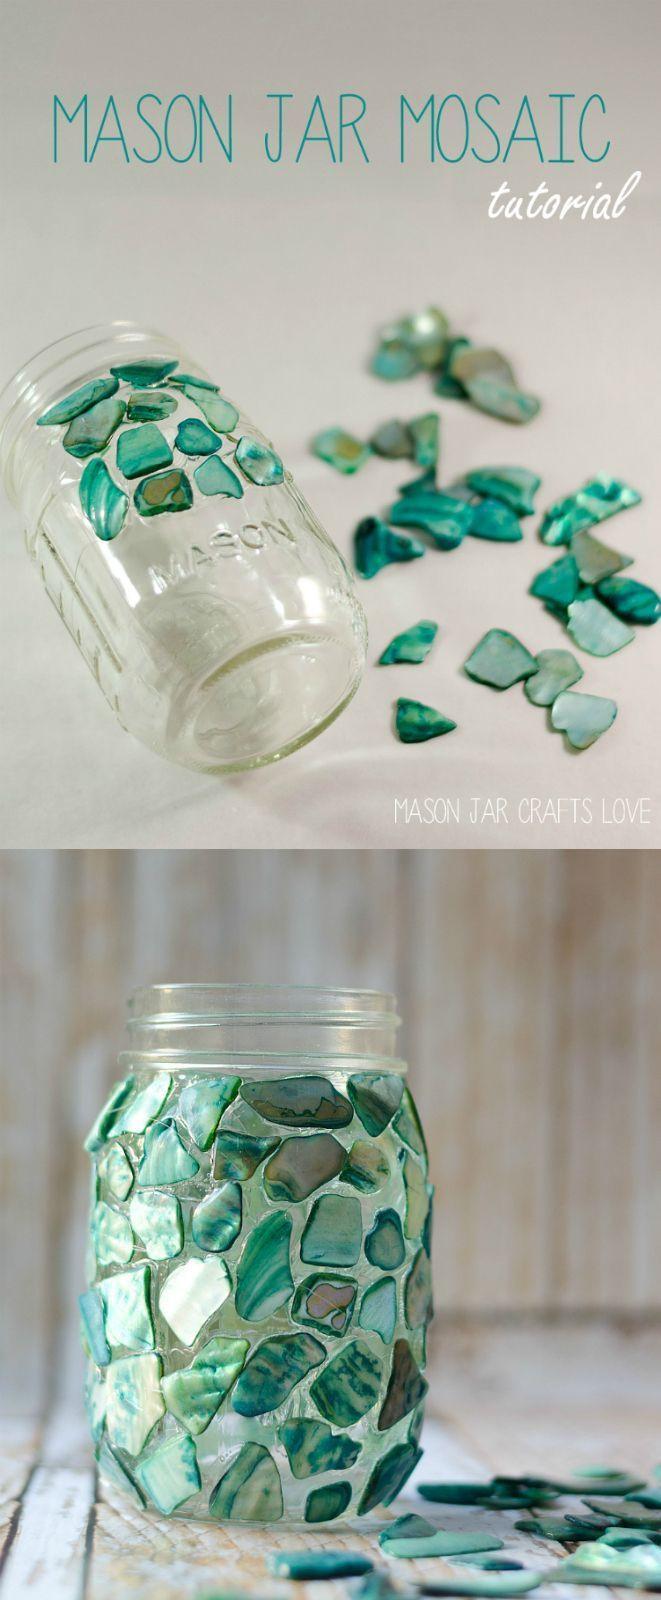 Best ideas about Mason Jar Craft Ideas . Save or Pin Best 25 Mason jar crafts ideas on Pinterest Now.